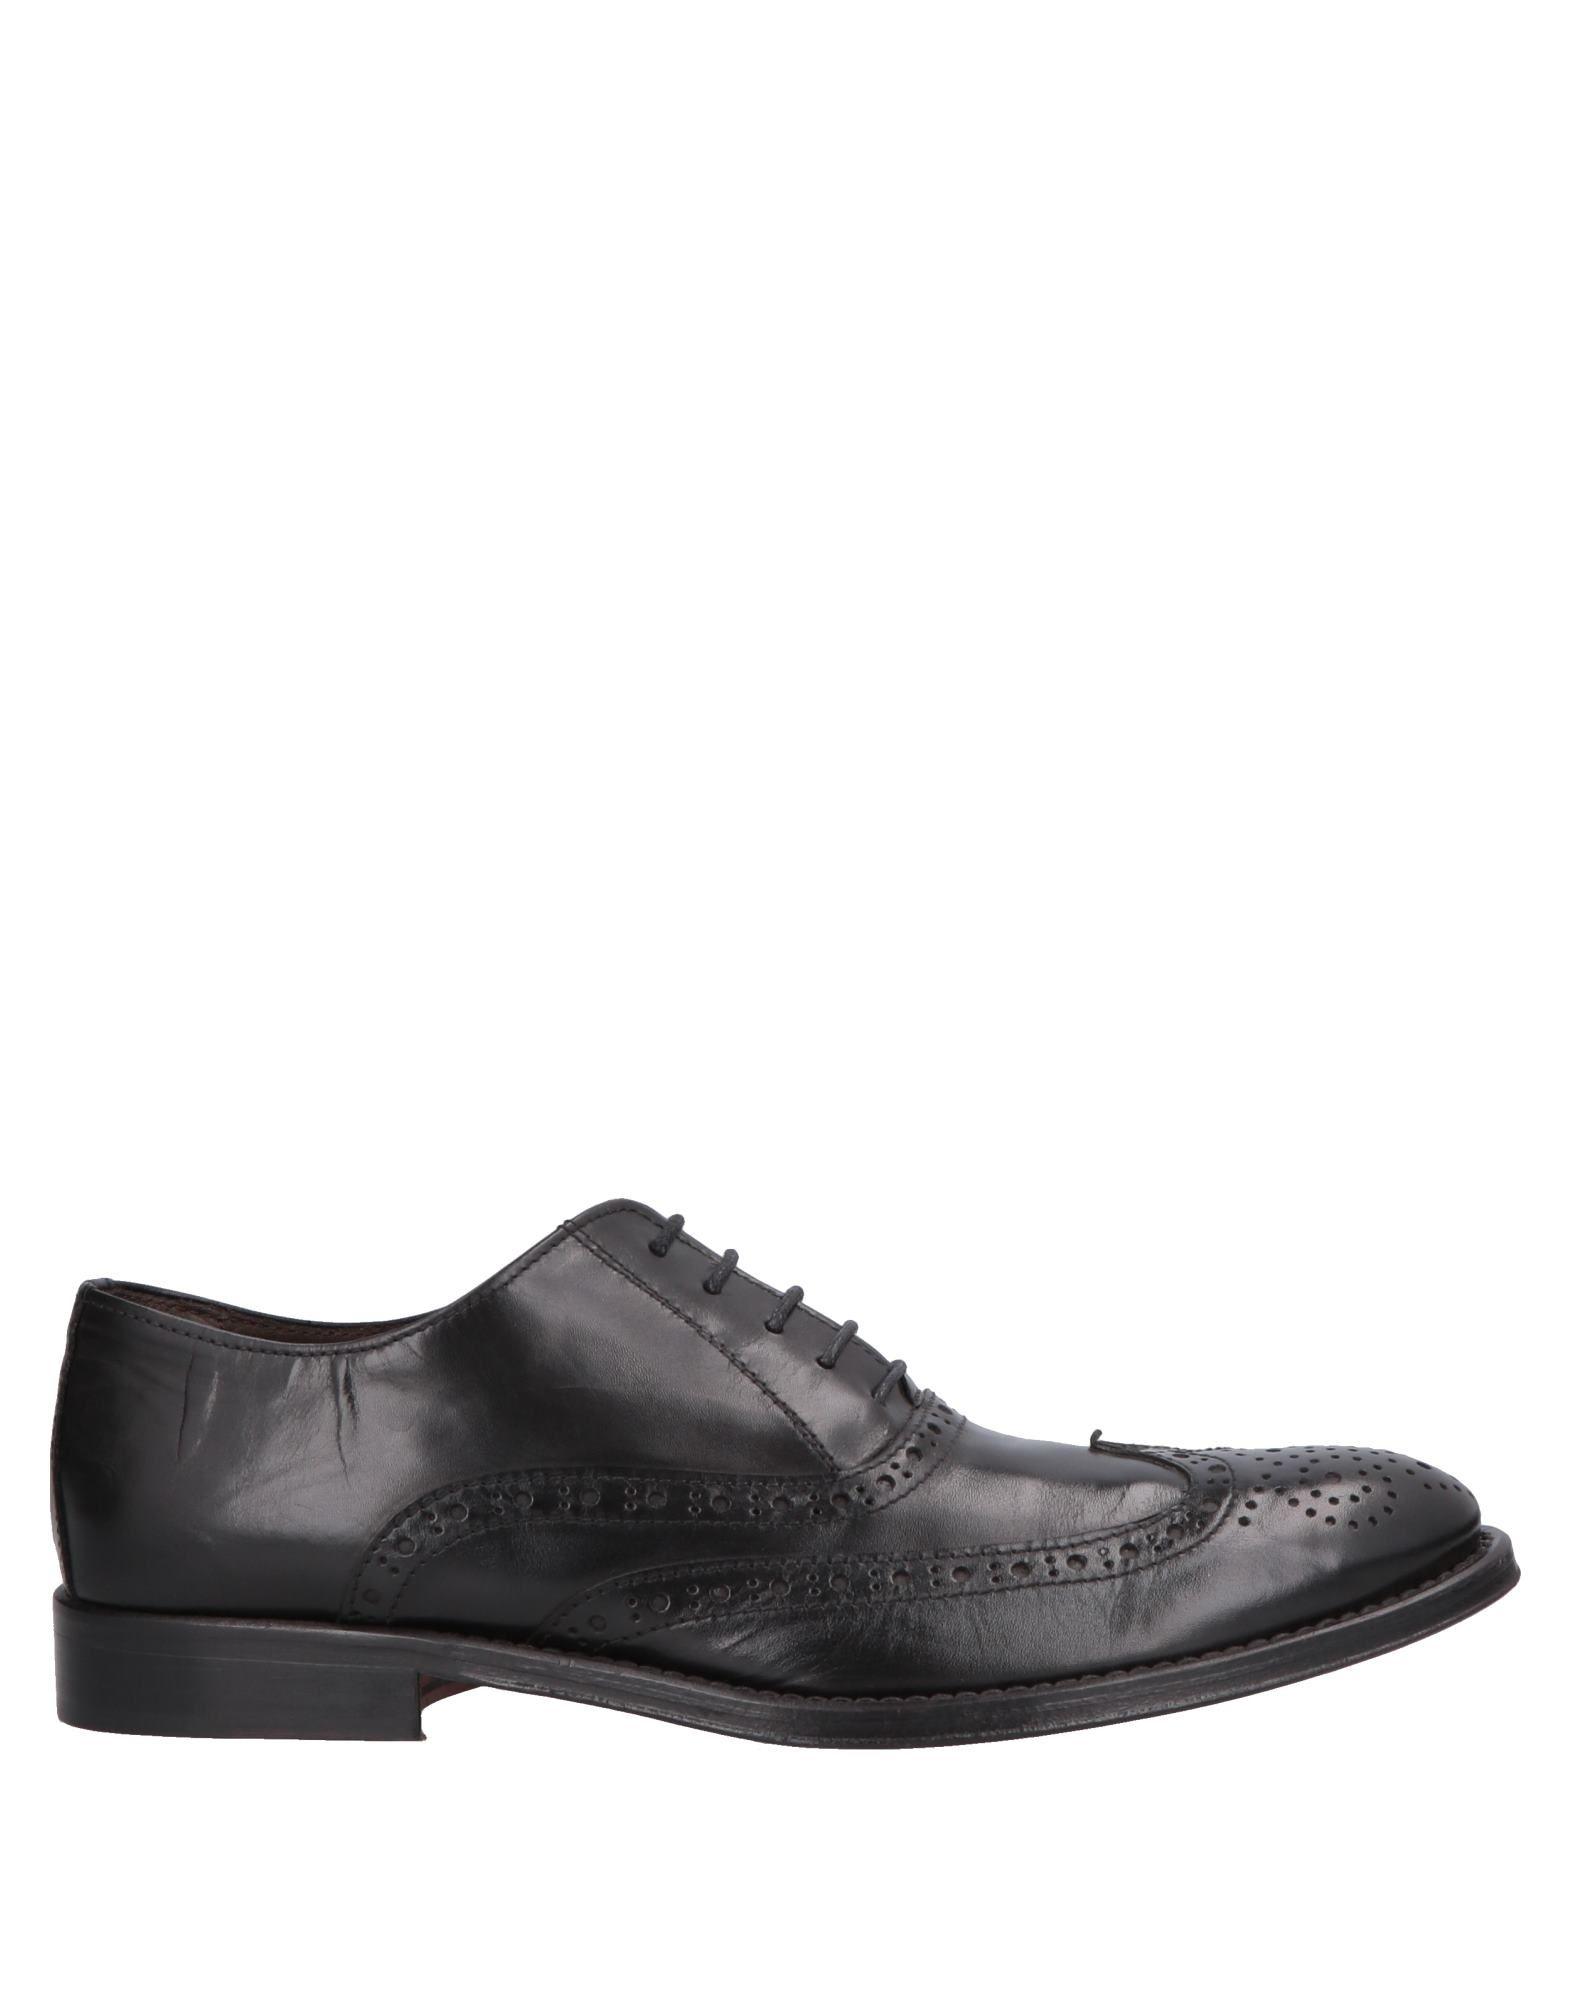 Фото - DEVON Обувь на шнурках обувь на высокой платформе dkny